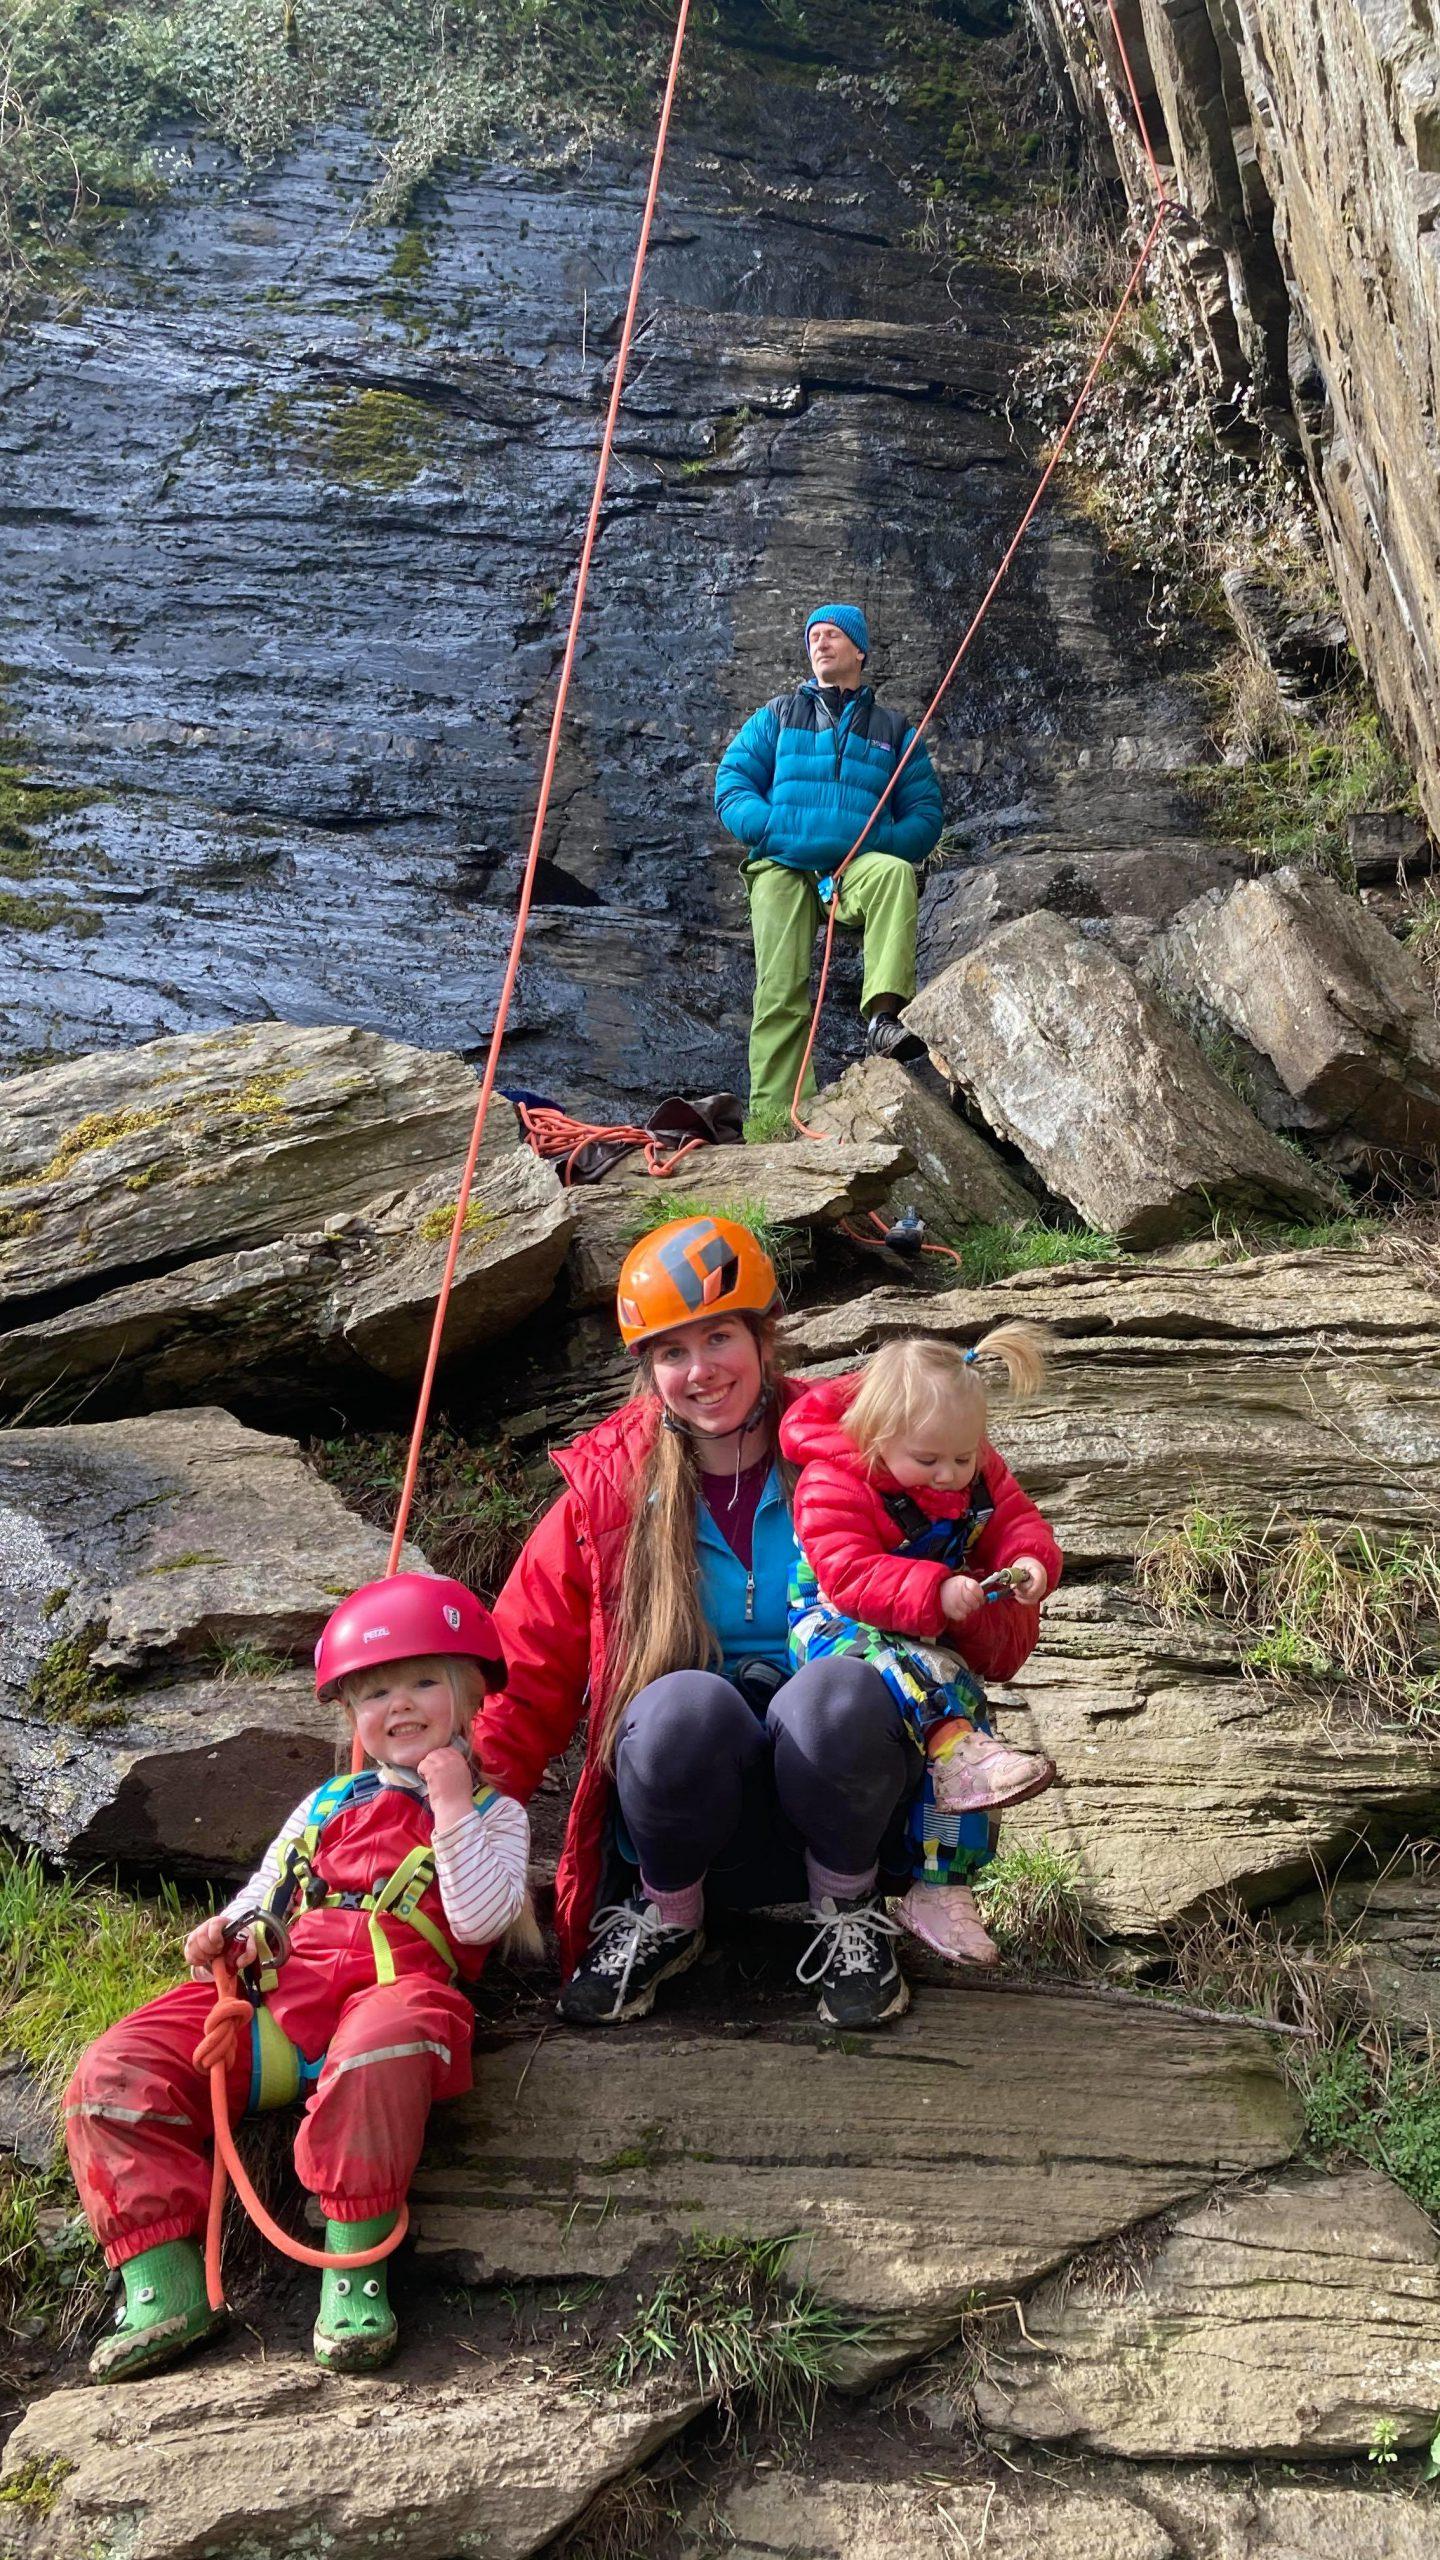 Rebekah Drummond, climber and mum